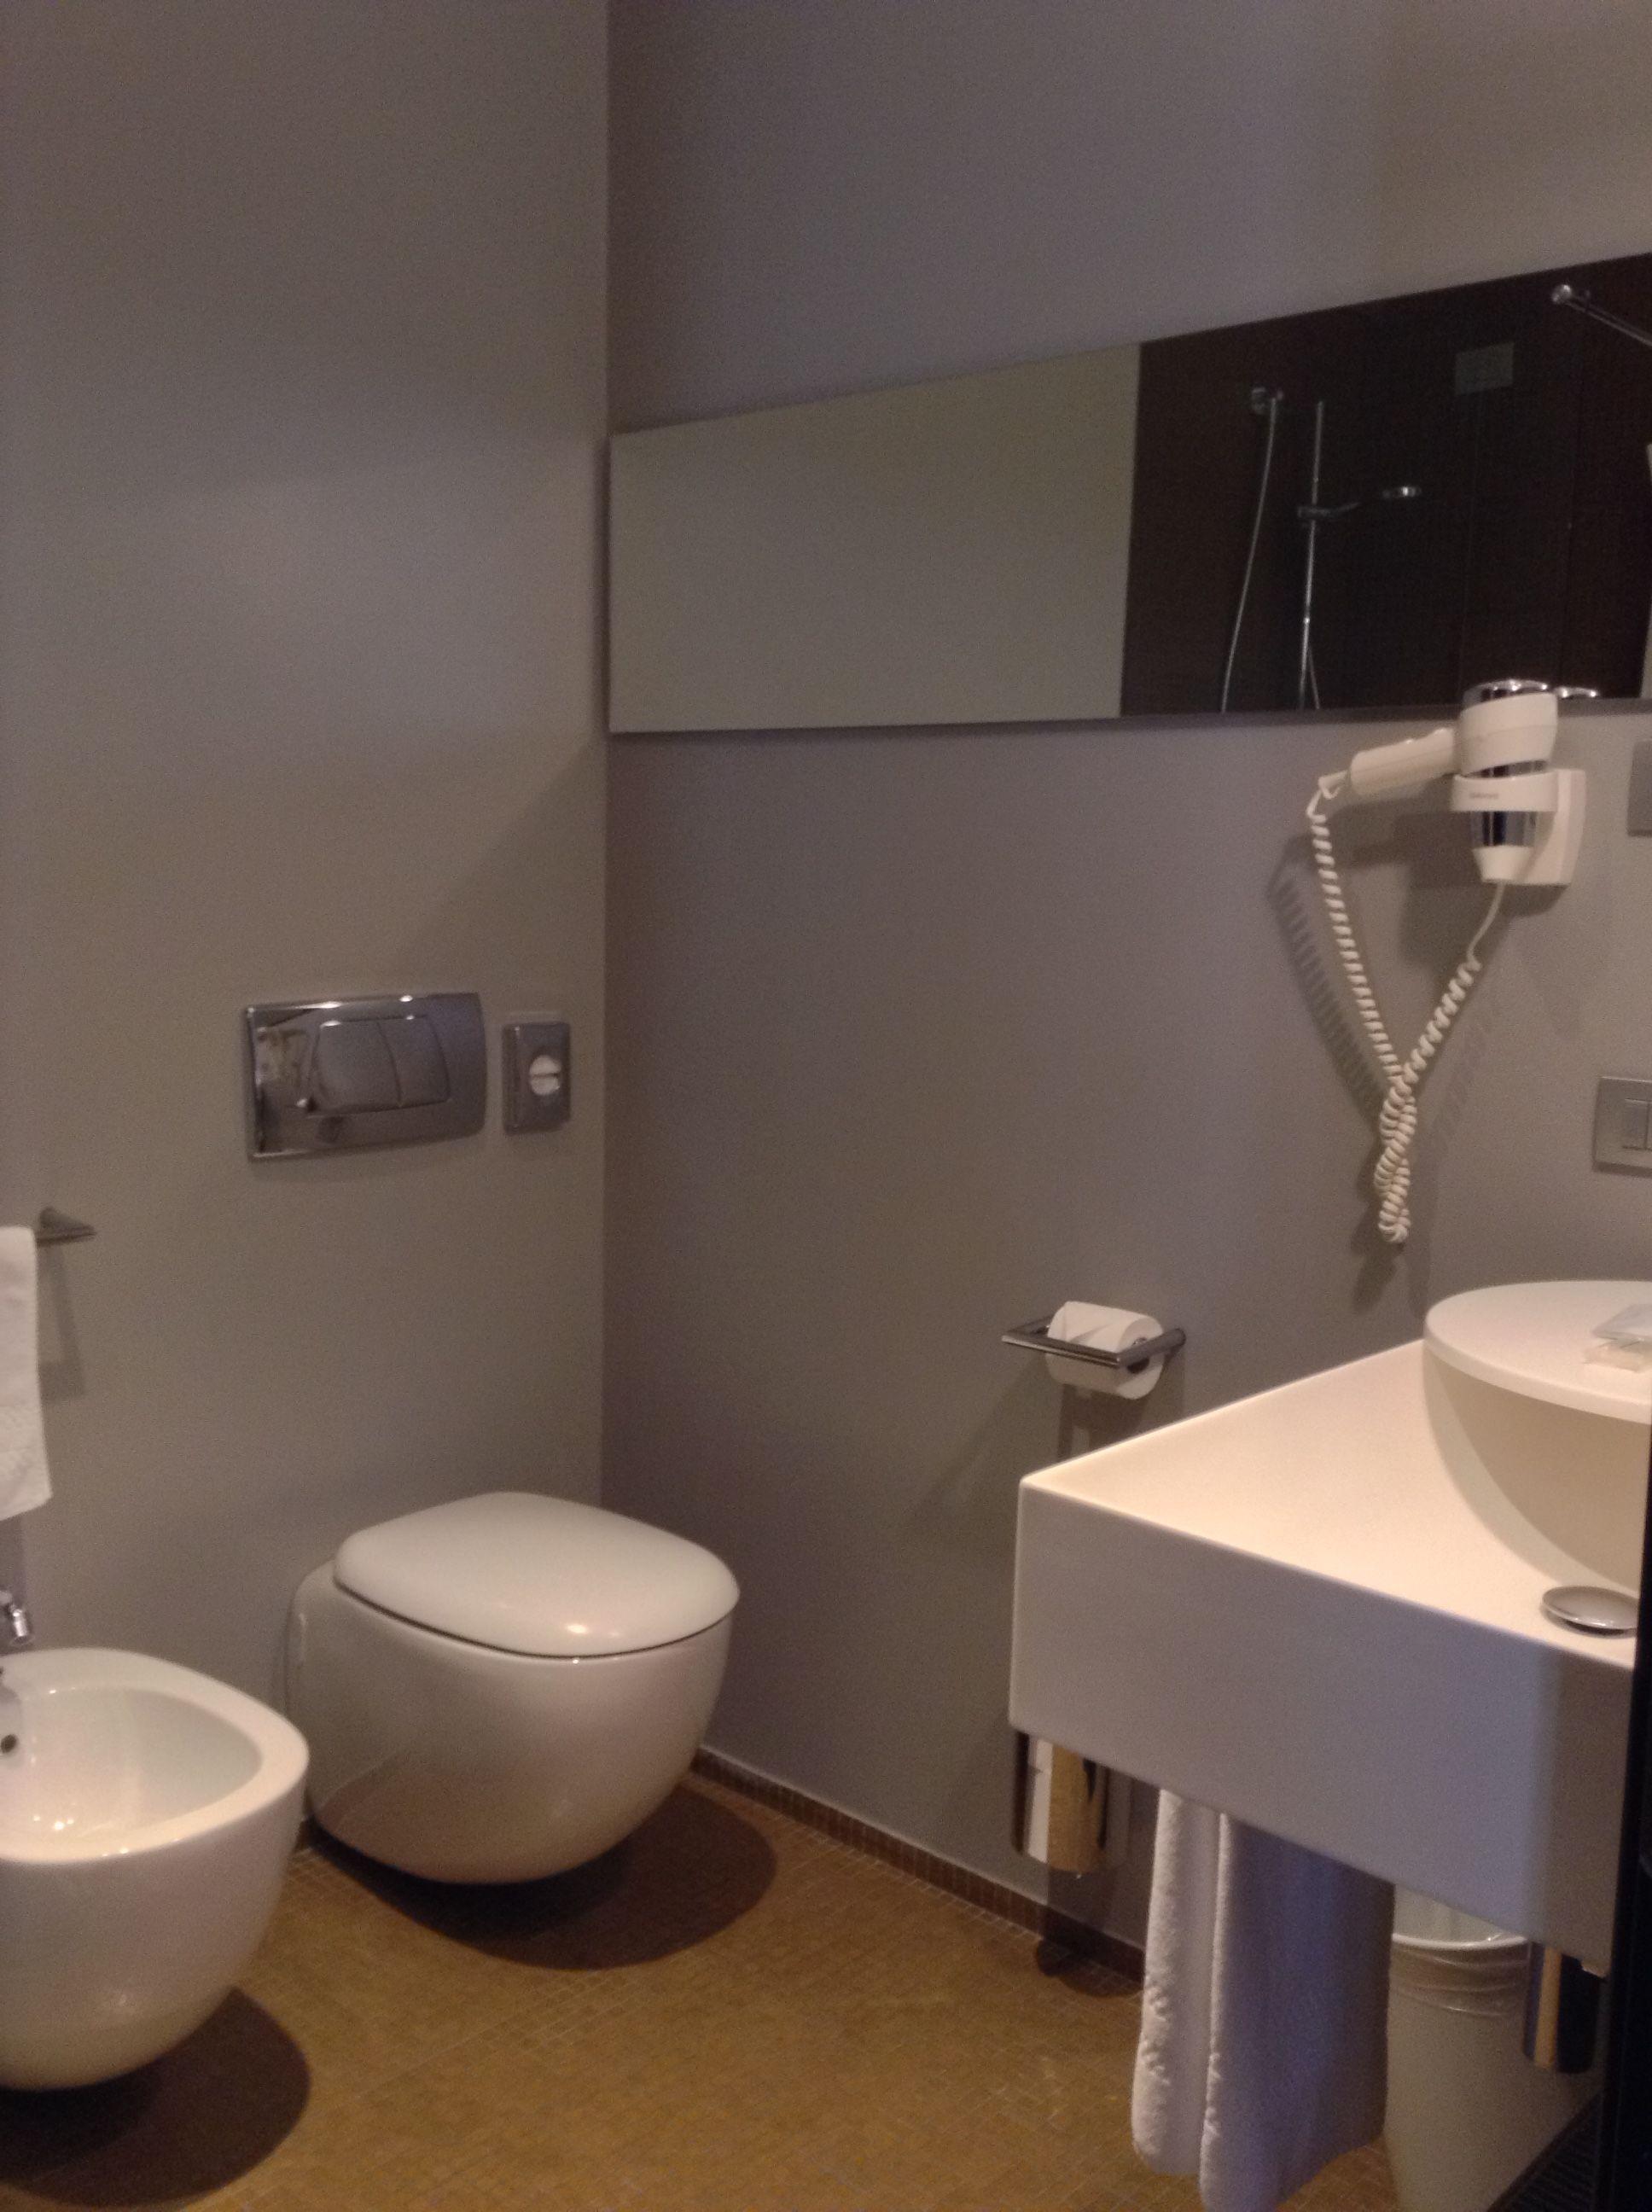 Pareti in resina bagno best coprire piastrelle e pareti del bagno con la resina with pareti in - Coprire piastrelle con resina ...